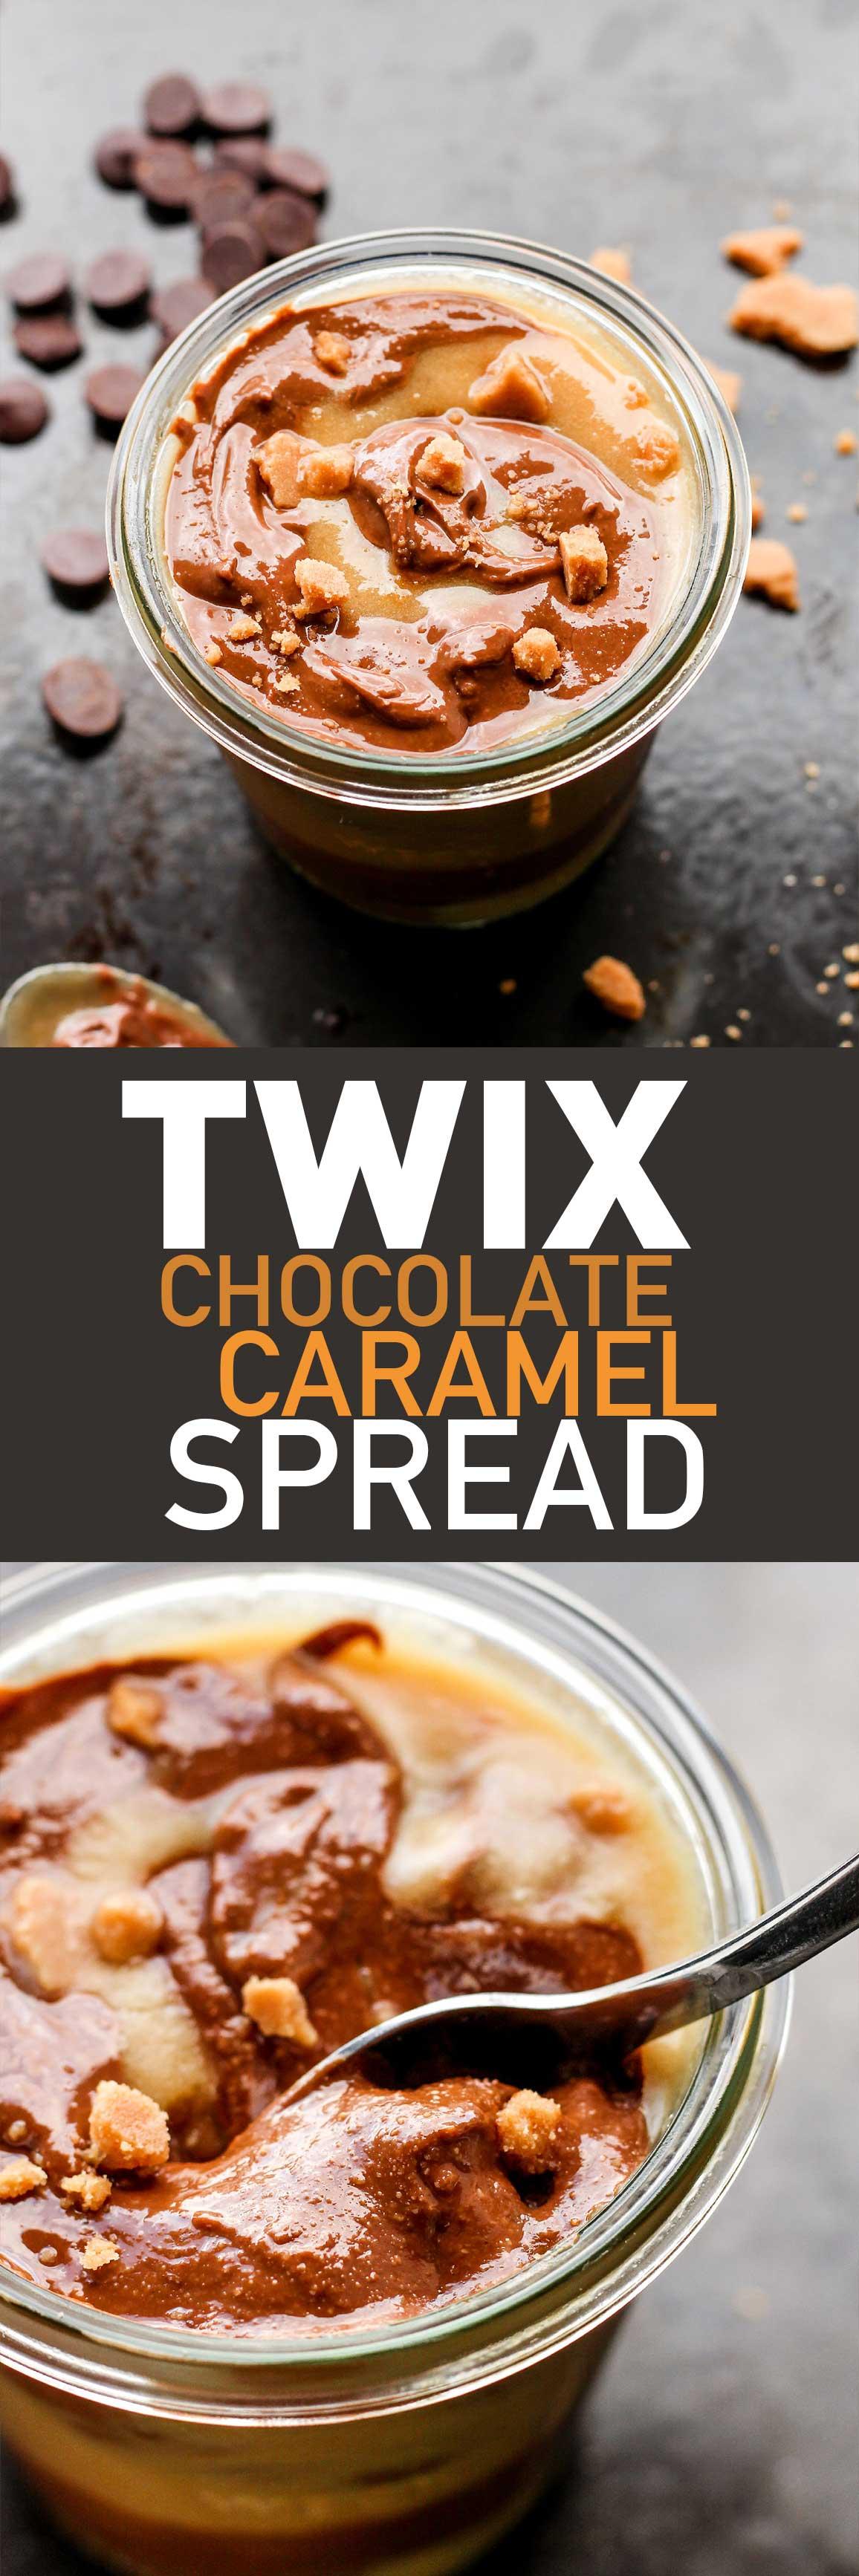 Twix Chocolate Caramel Spread